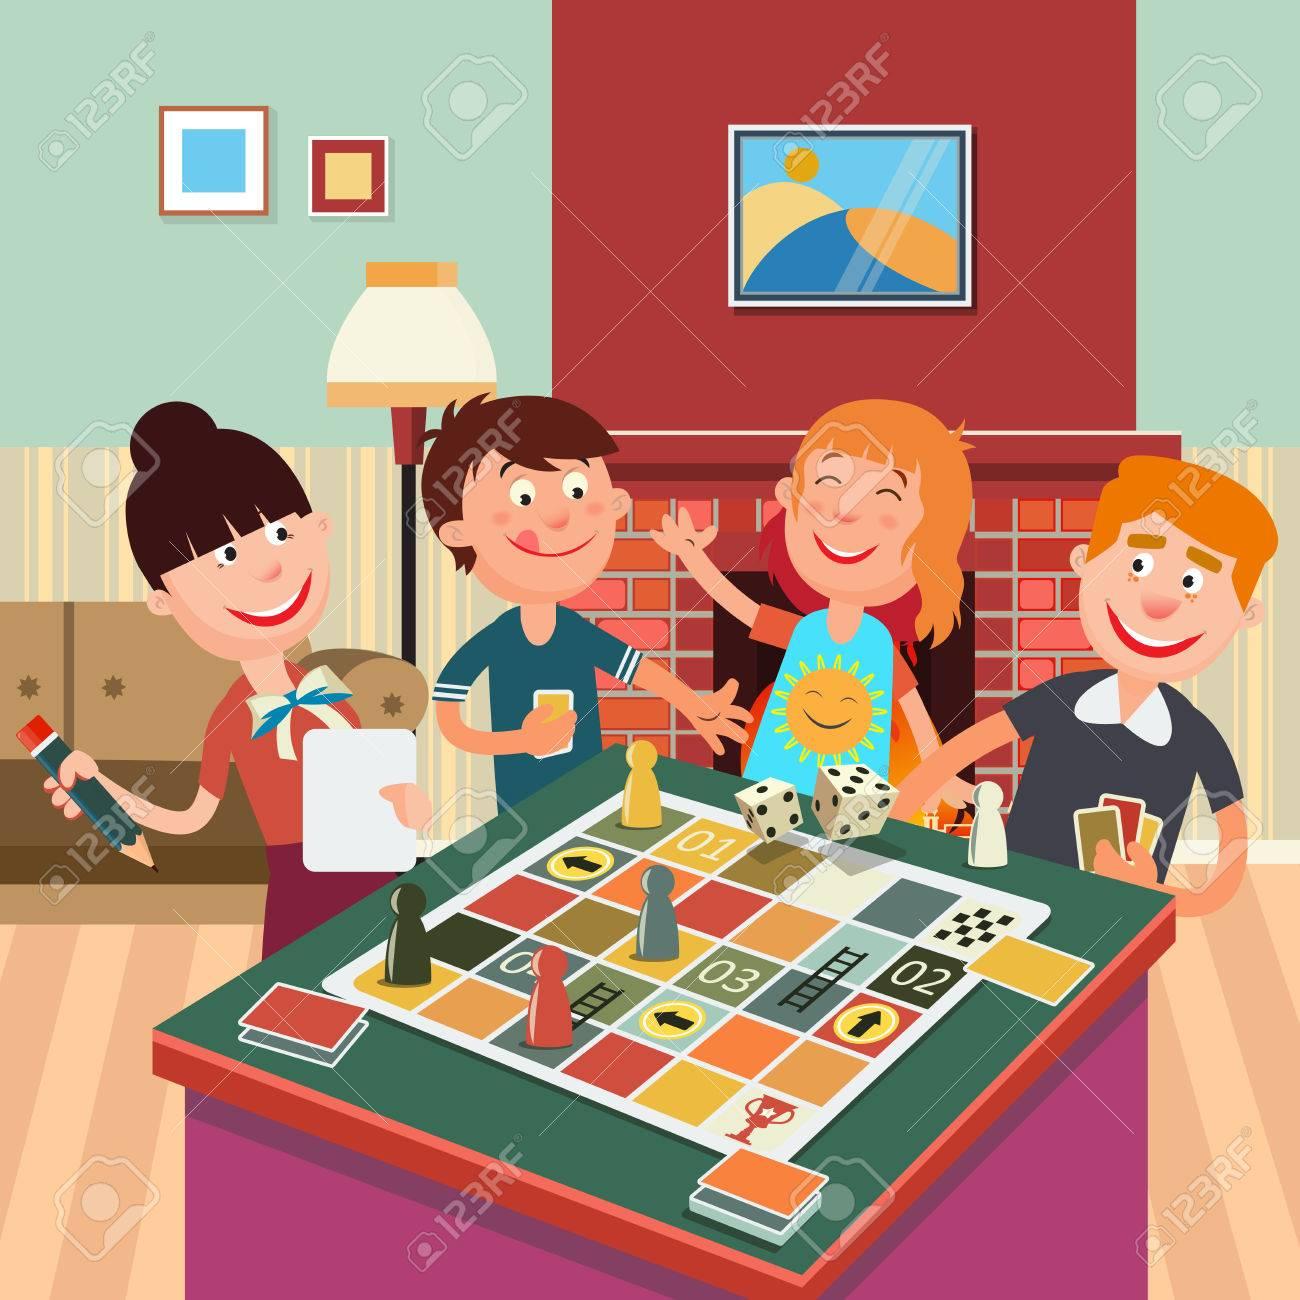 Familia Que Juega El Juego De Mesa Fin De Semana De La Familia